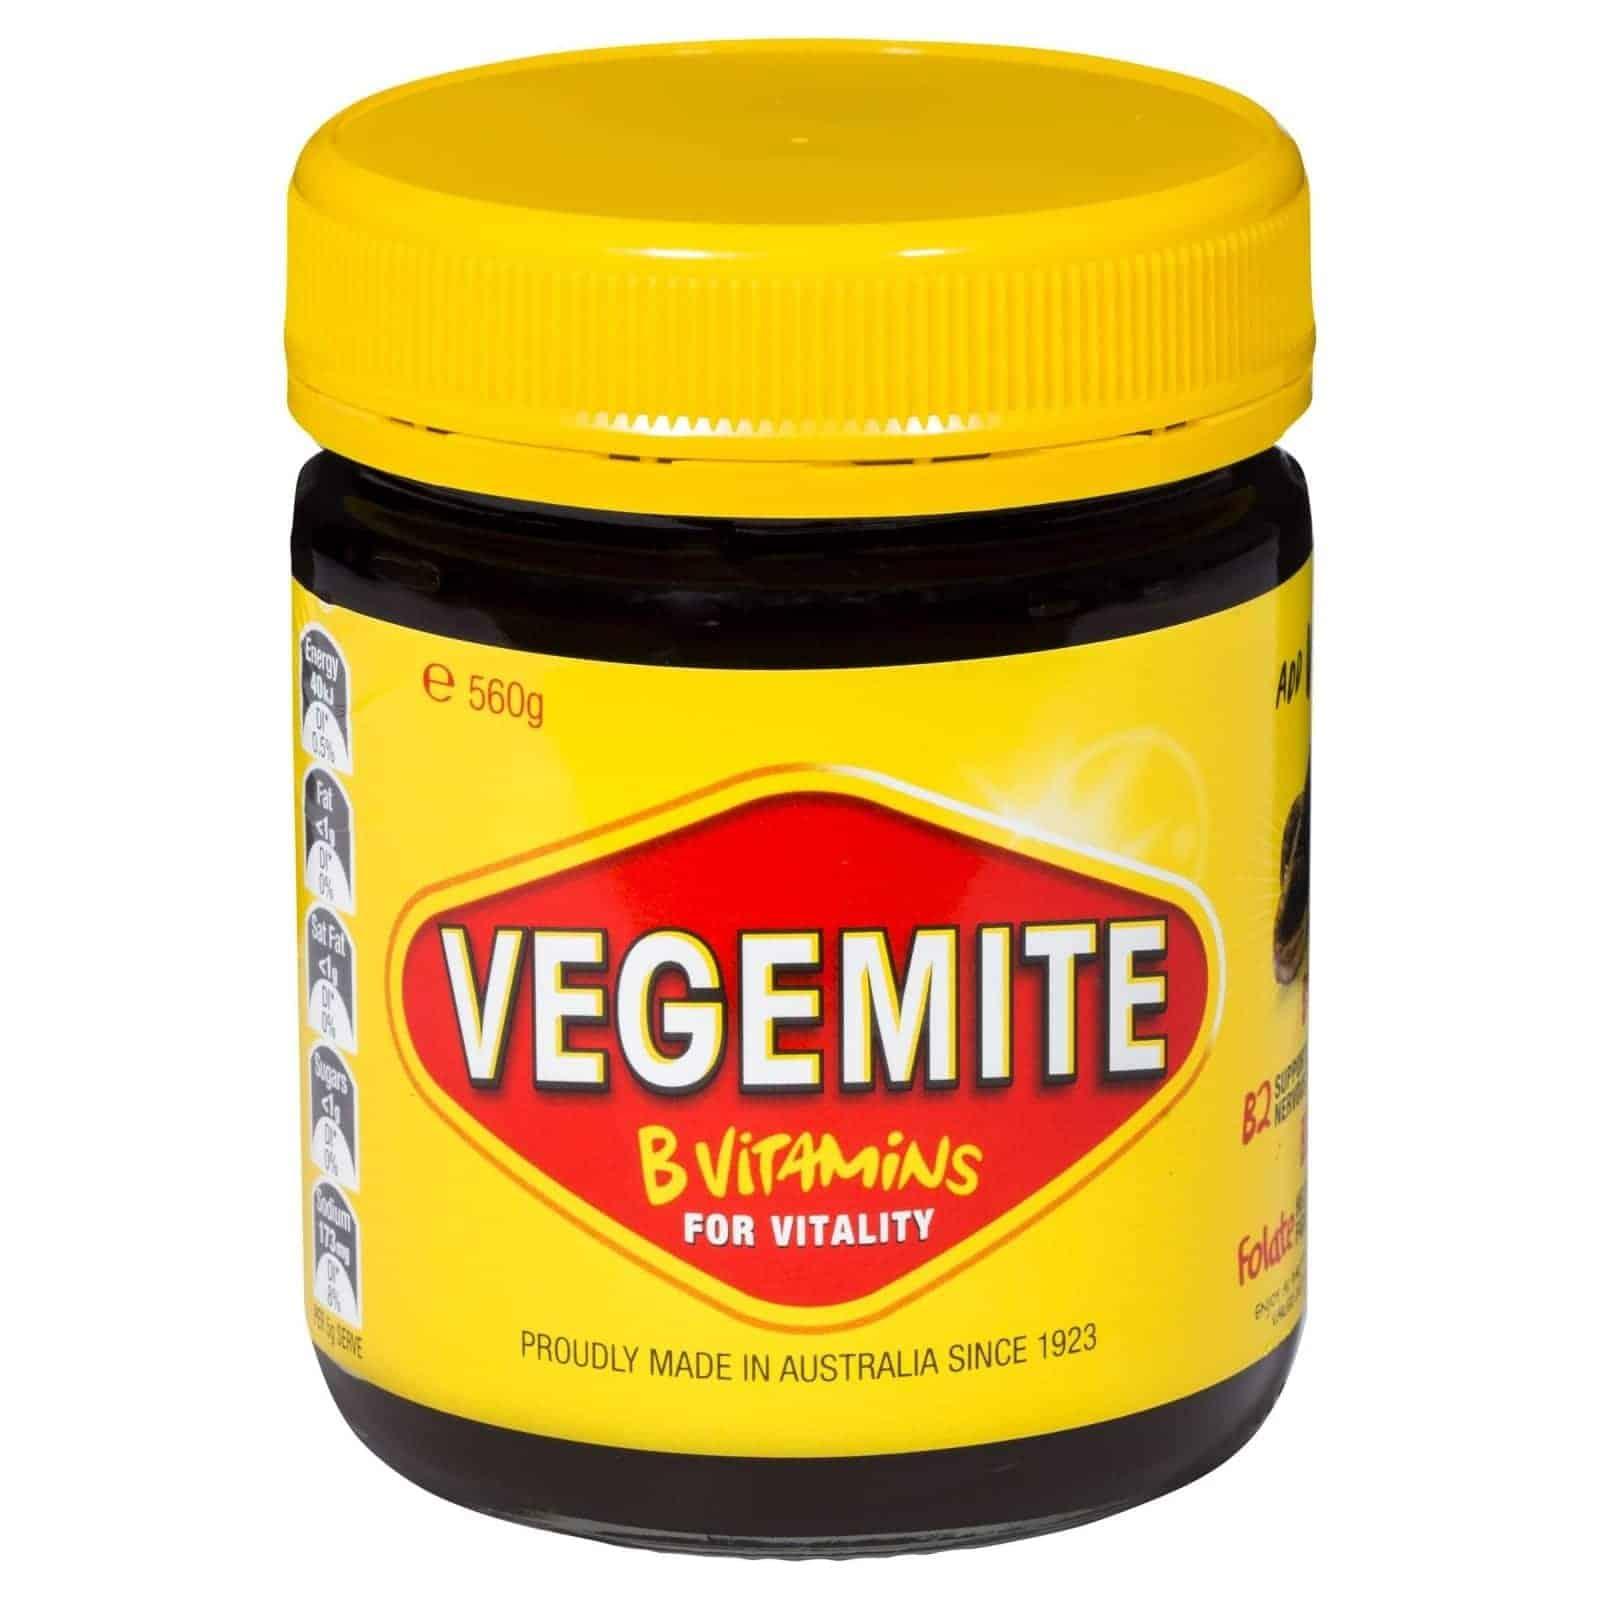 Vegemite Spread Large 560g Jar X 2 Bulk Value Box The